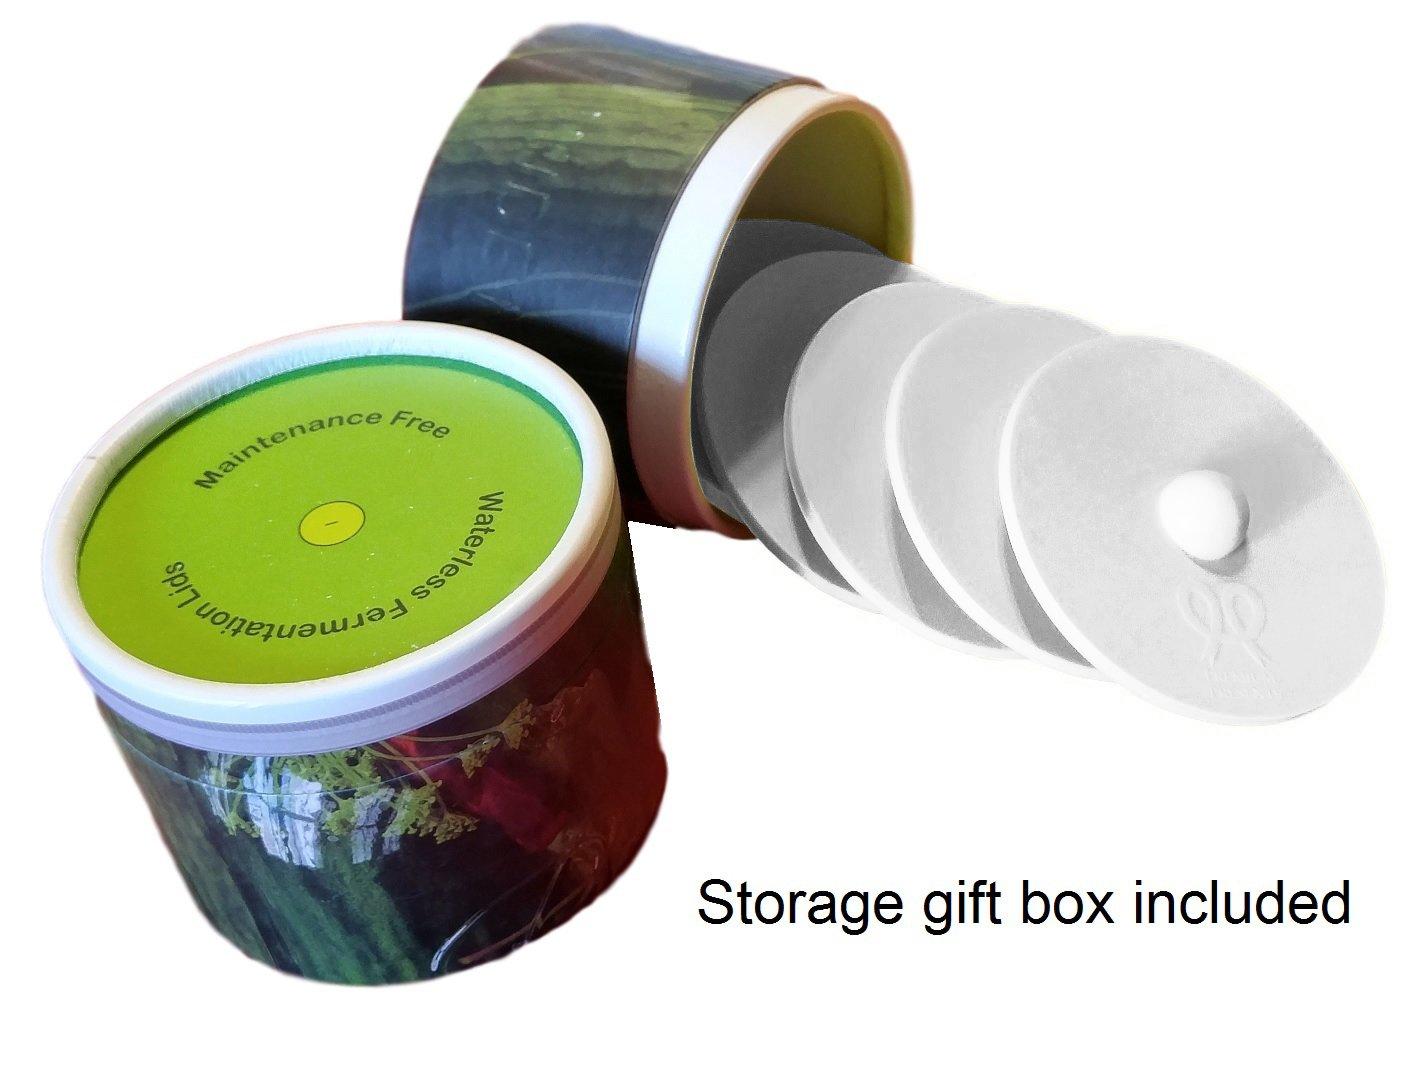 Maintenance free silicone airlock waterless fermentation lids for wide mouth mason jars. BPA free, mold free, dishwasher safe. 5 pack. Premium Presents. White